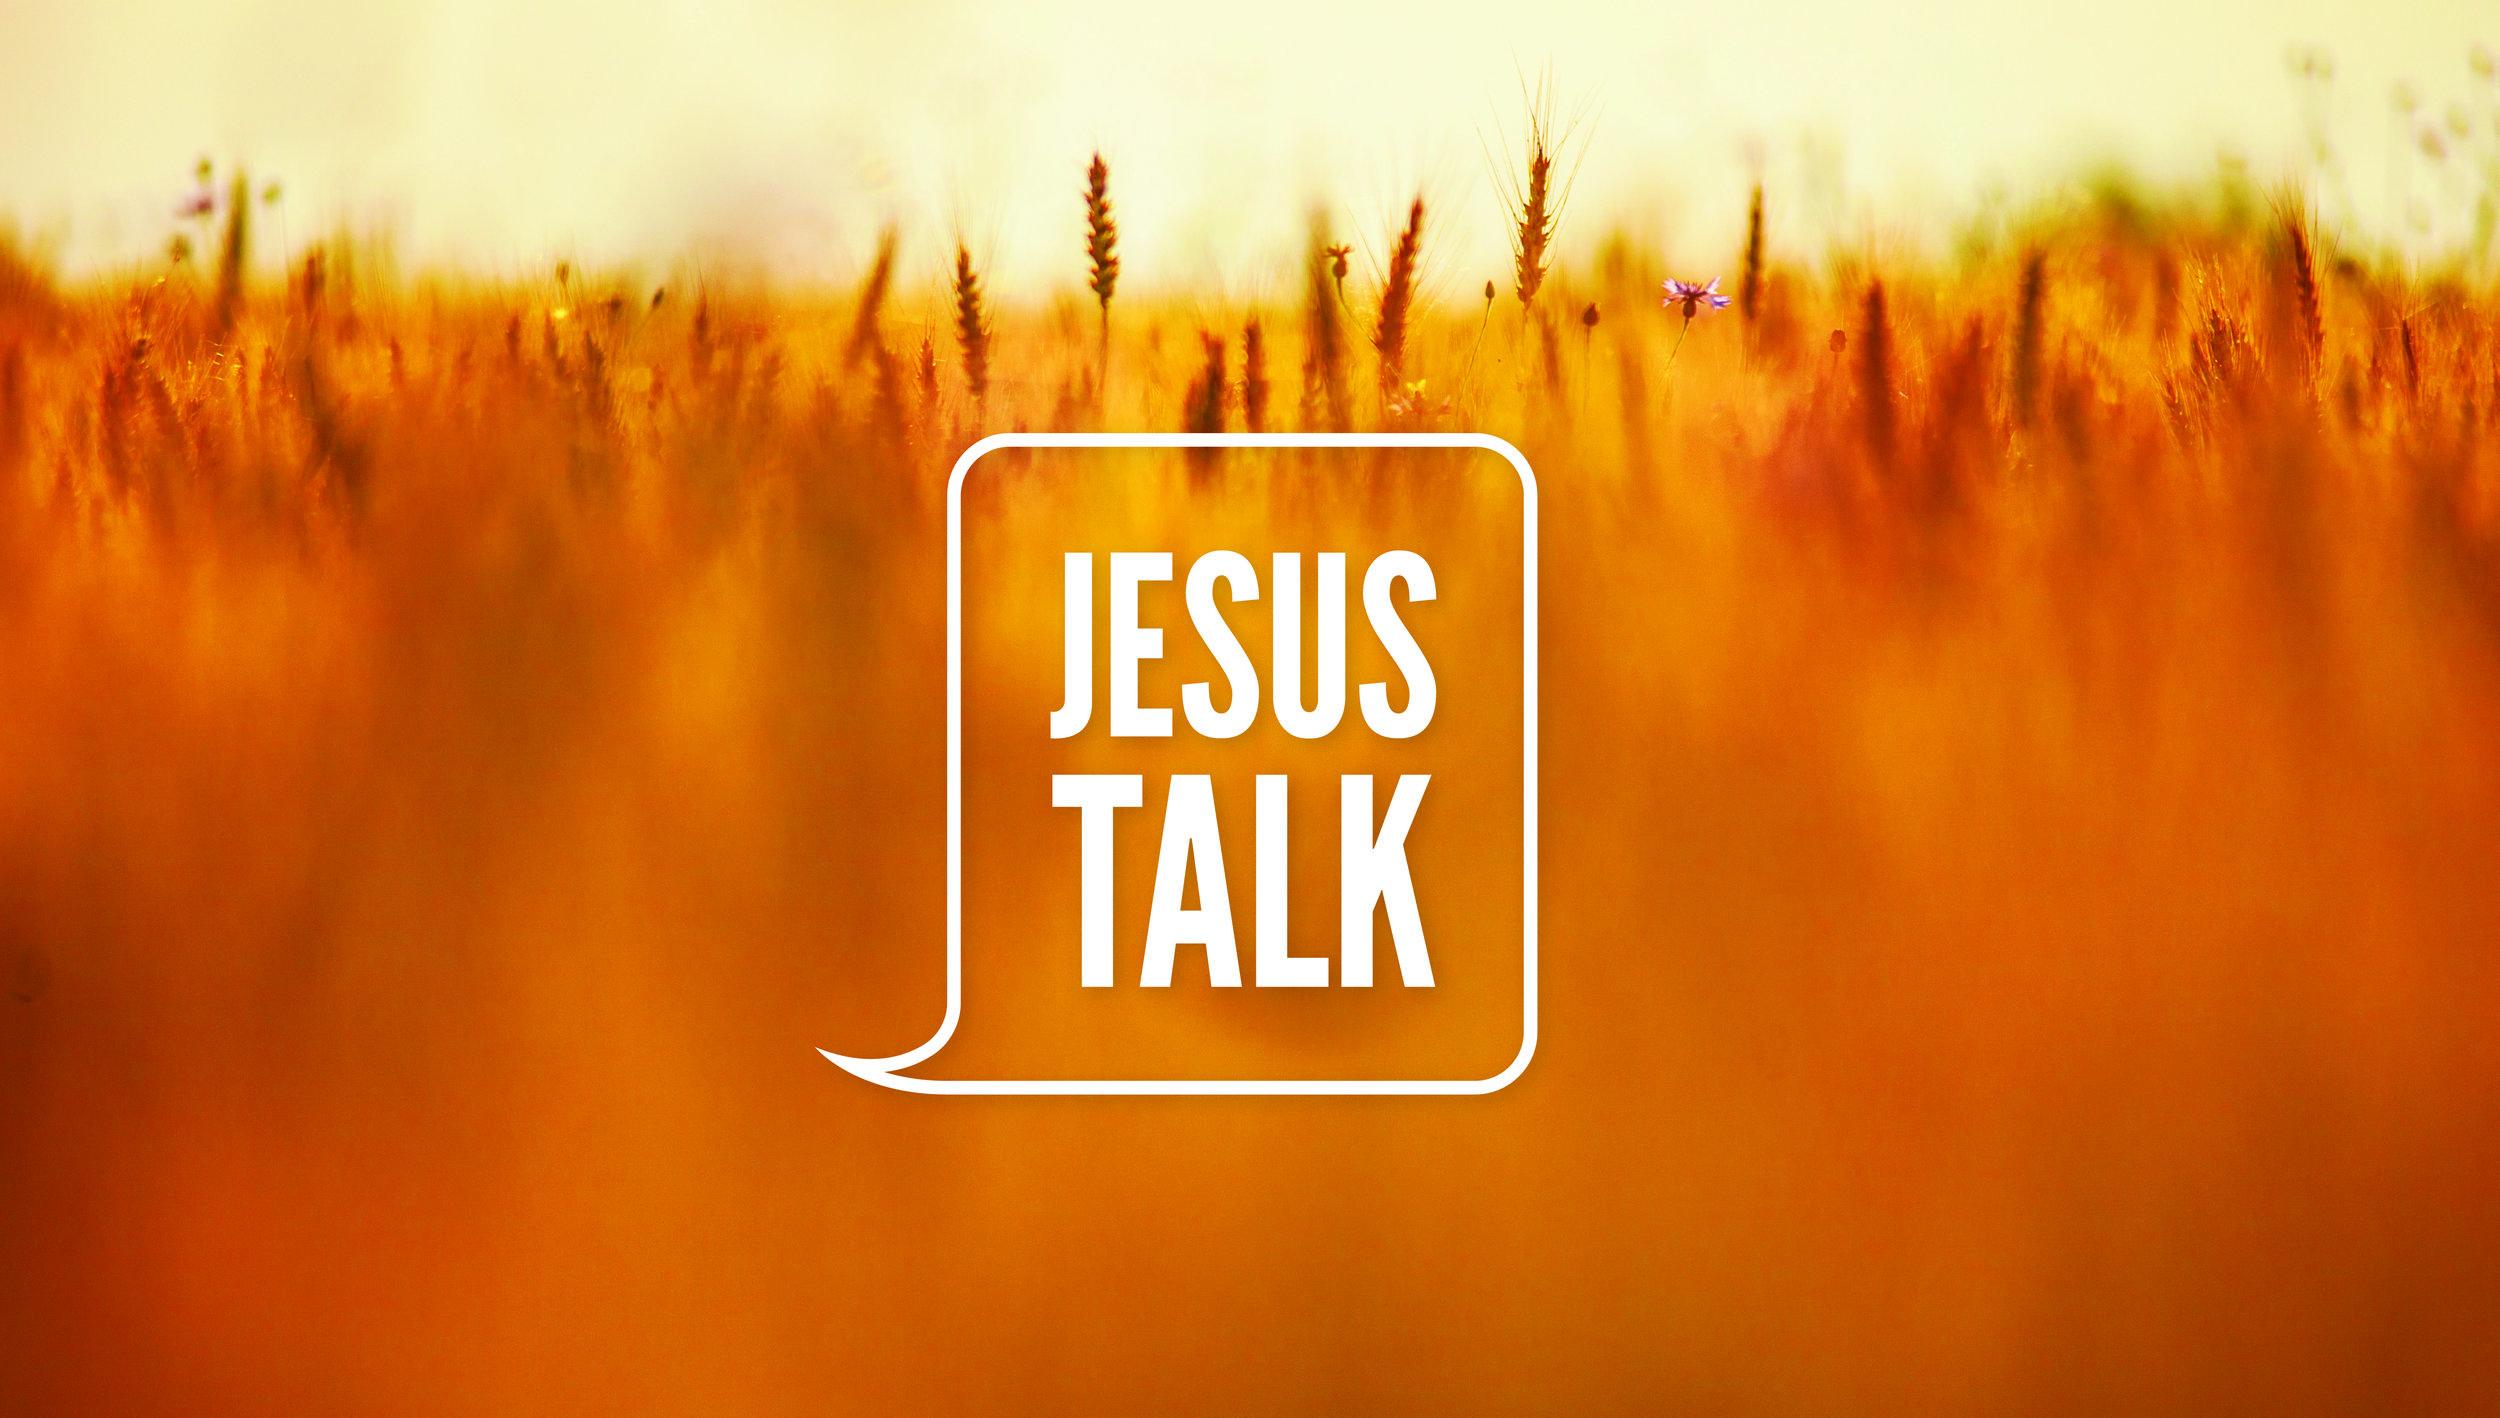 Jesus Talk-01.jpg